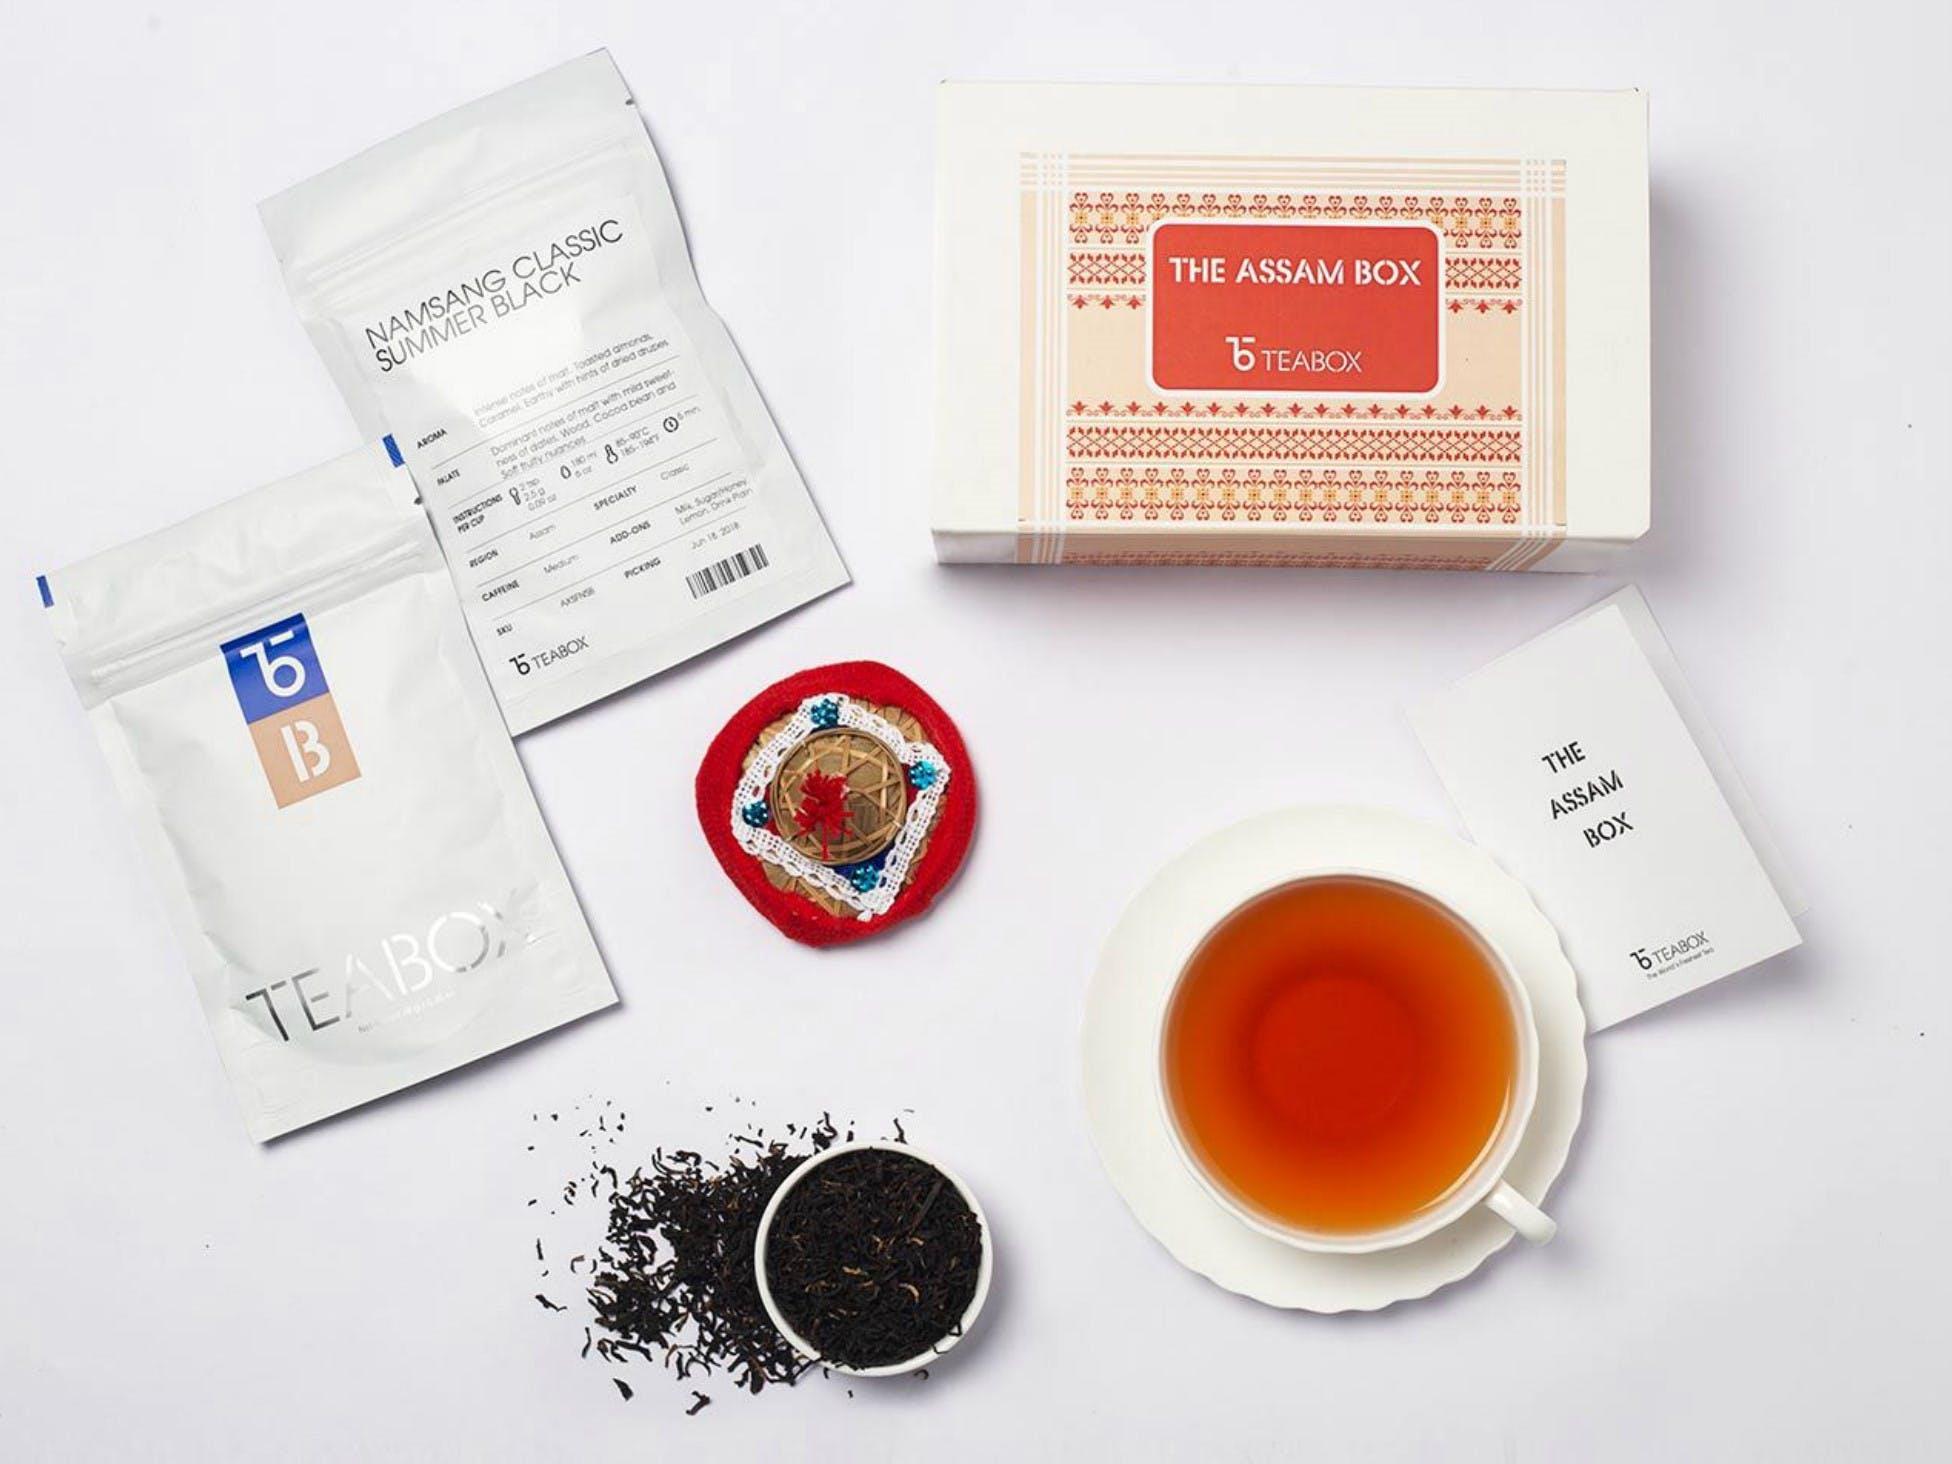 Teabox - Tea Subscription Box